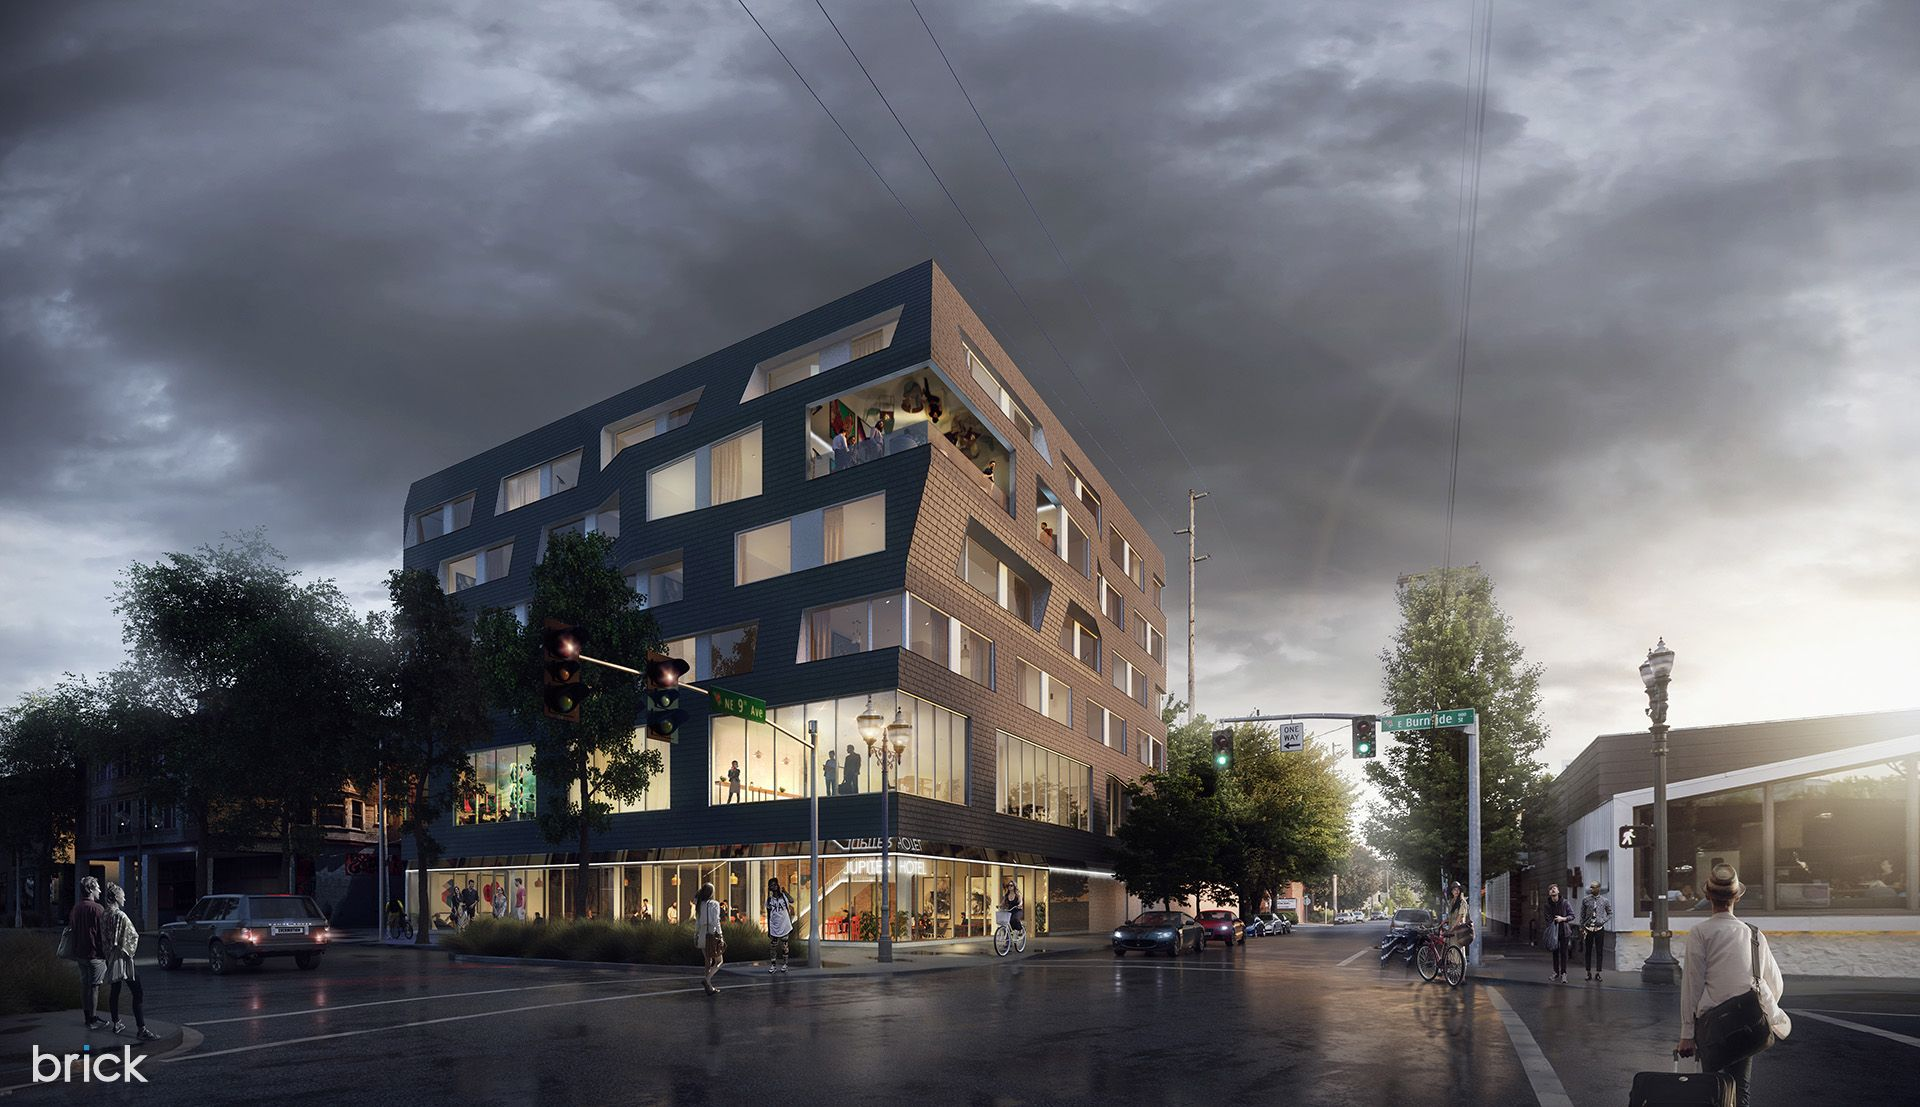 Best of Week 44/2016 - Jupiter Hotel, Portland, Oregon by Brick Visual - Ronen Bekerman - 3D Architectural Visualization & Rendering Blog